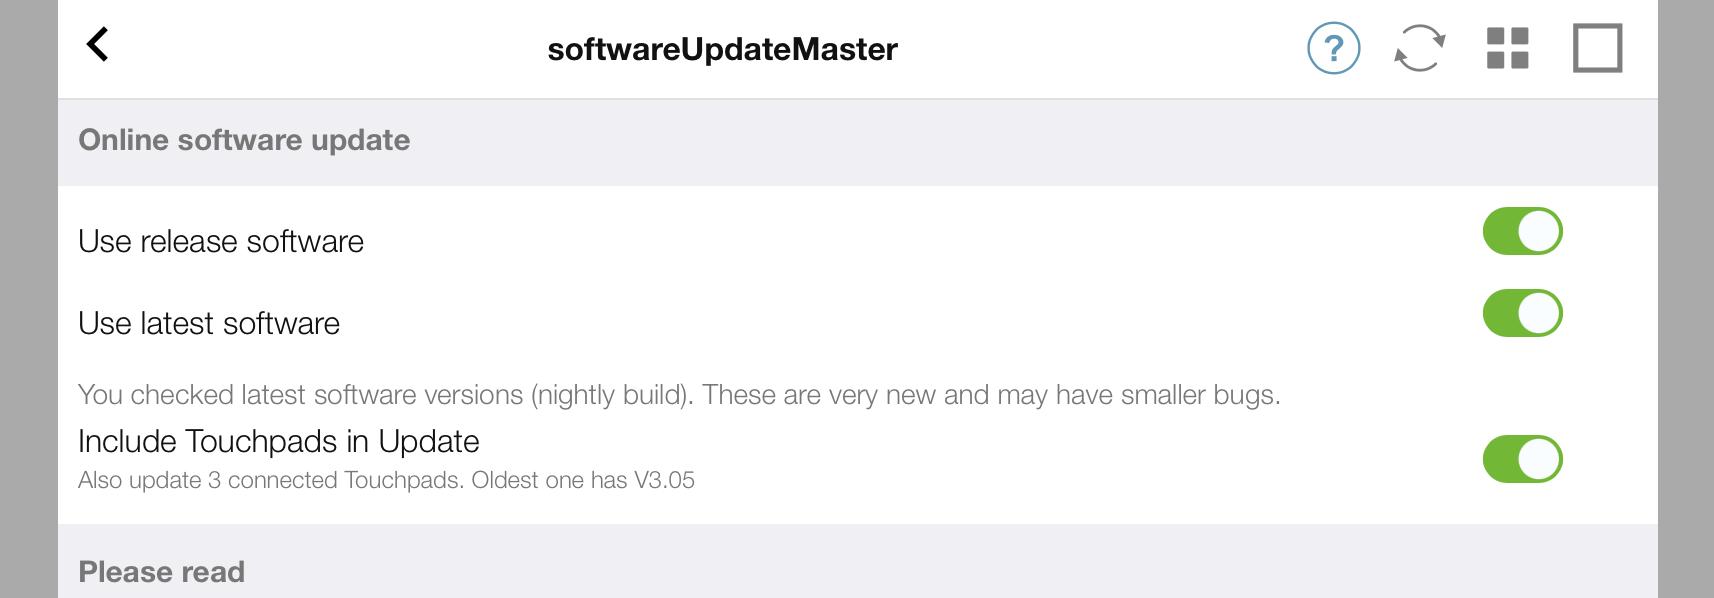 screenshot-softwareupdate-screen